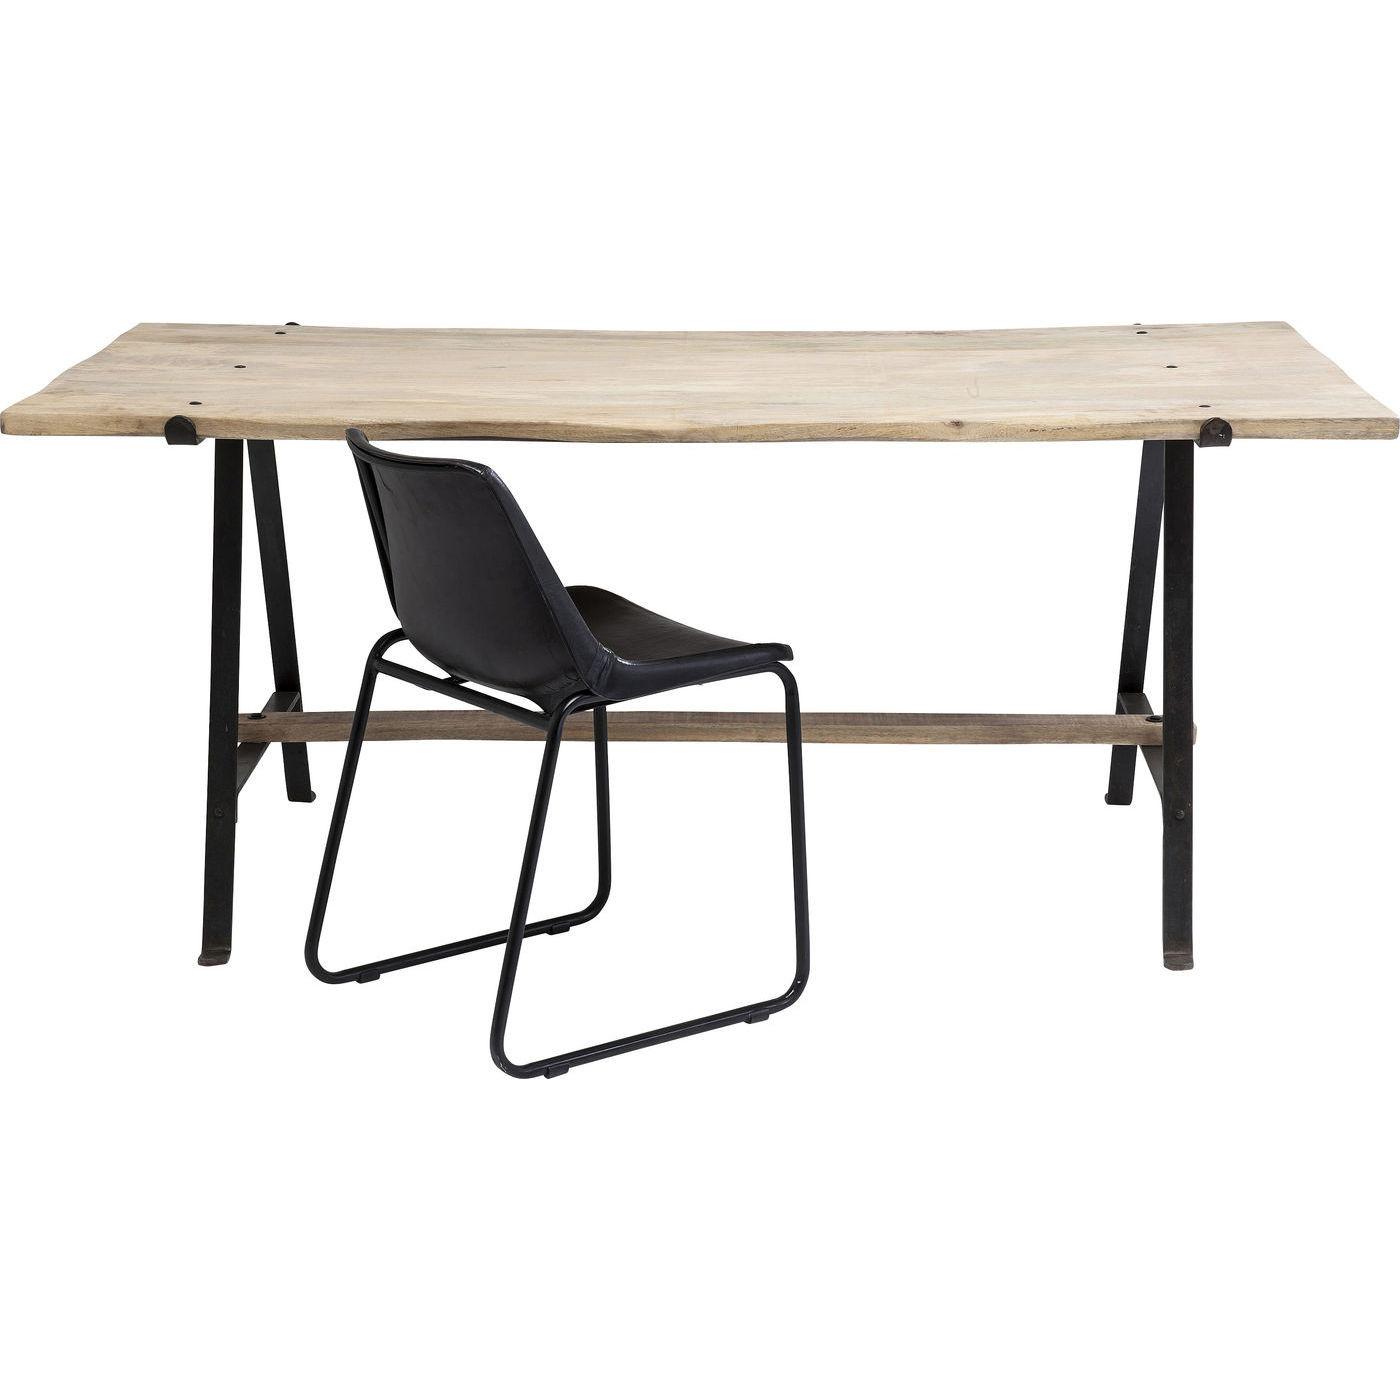 tisch scissors 180x90cm kare design mutoni m bel. Black Bedroom Furniture Sets. Home Design Ideas